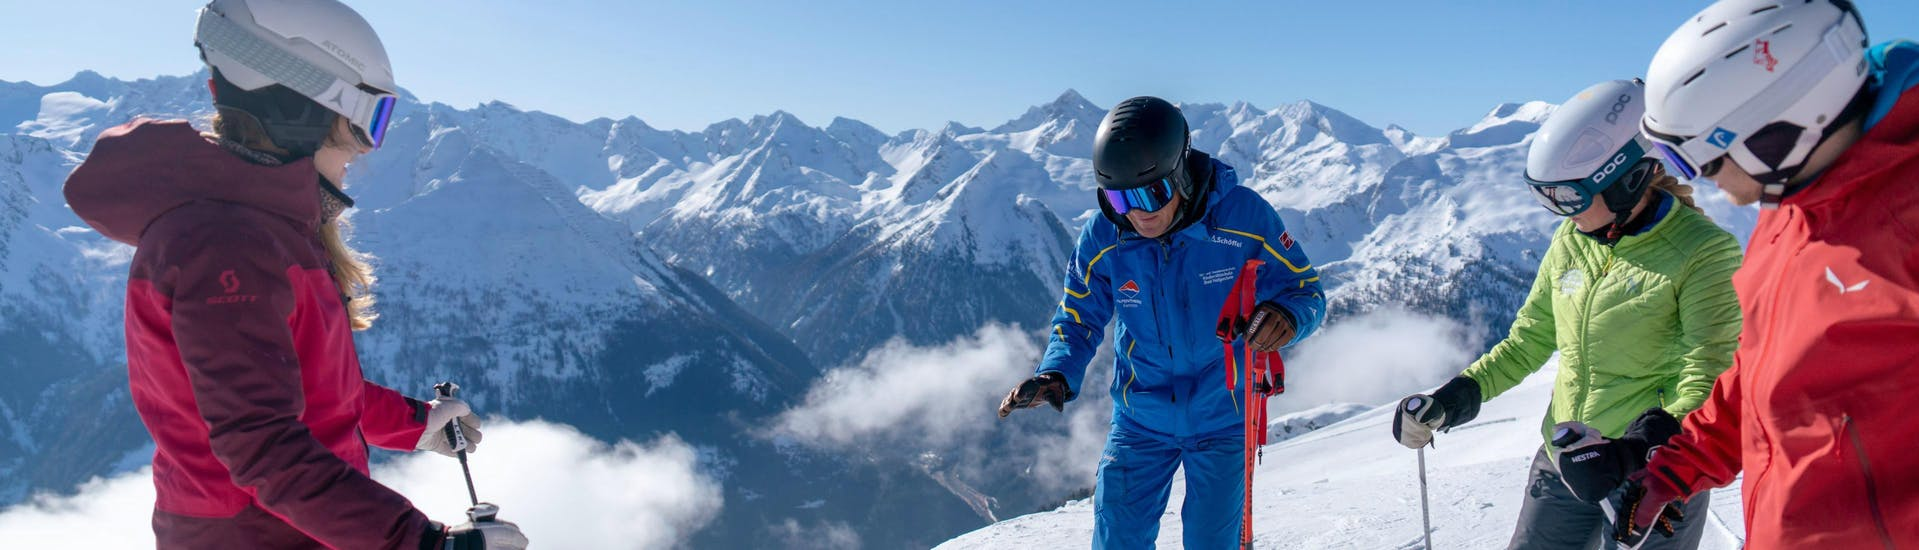 Teens Ski Lessons (12-17 y.) for Advanced Skiers